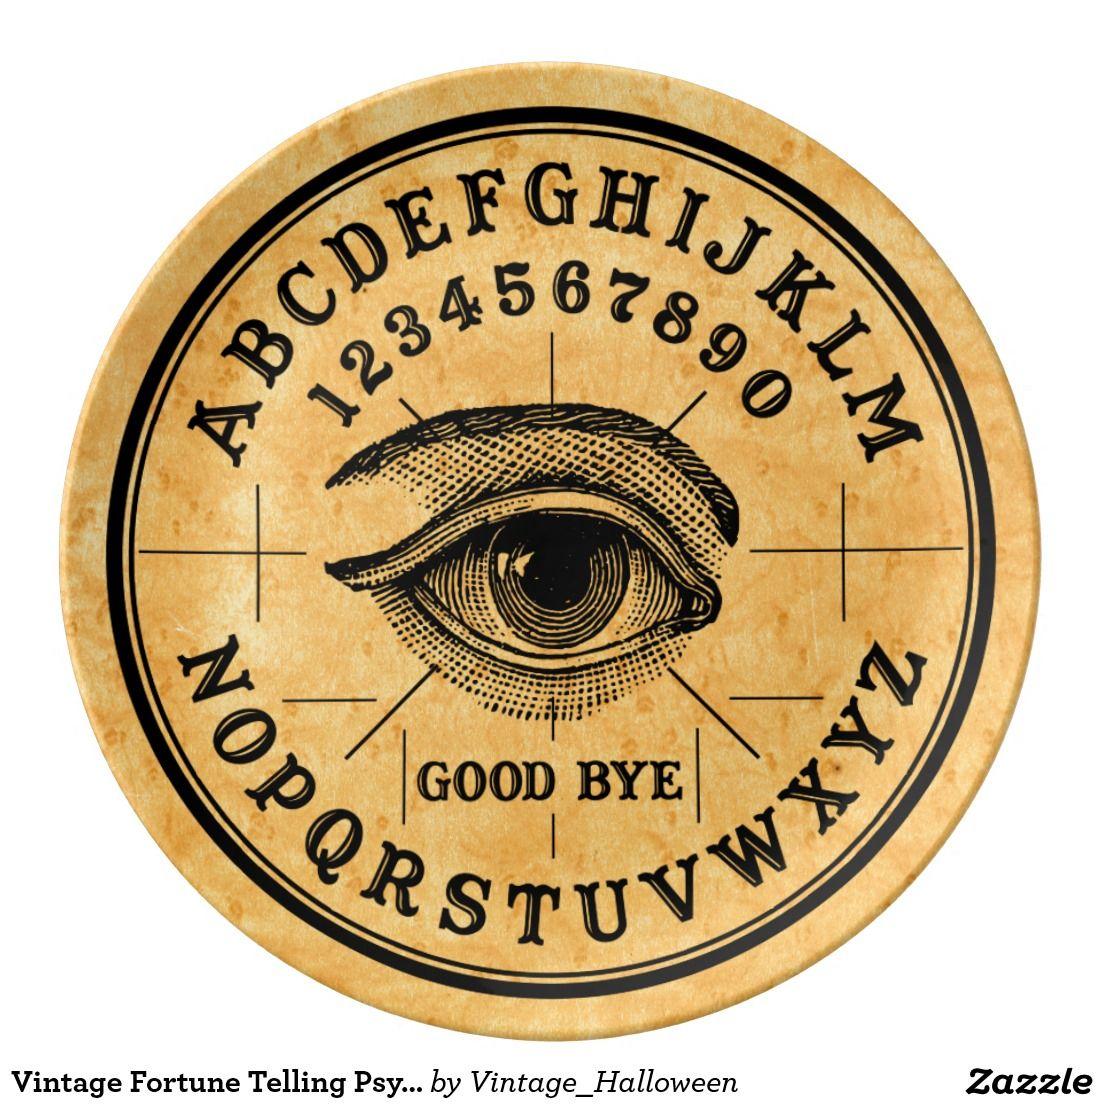 Vintage Fortune Telling Psychic Eye Plate